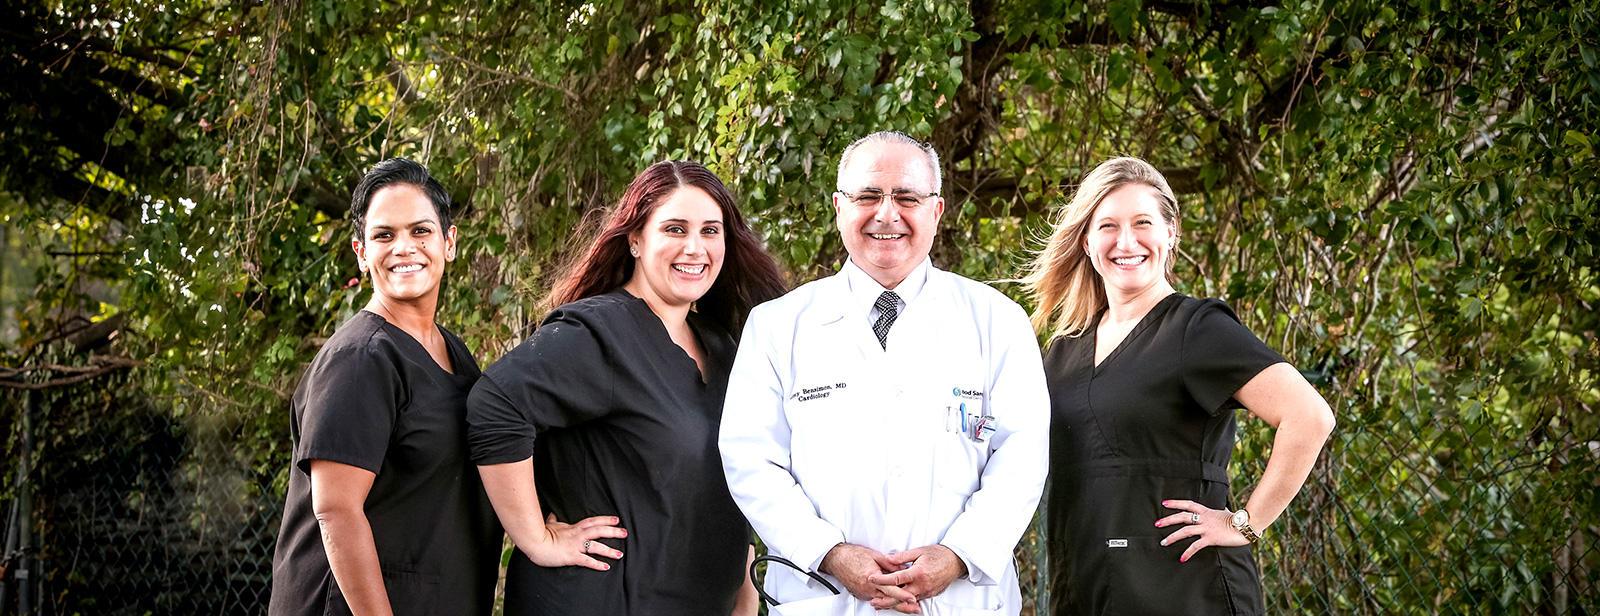 Dr. Jaimy H Bensimon, MD - Palm Beach Medical Center image 0